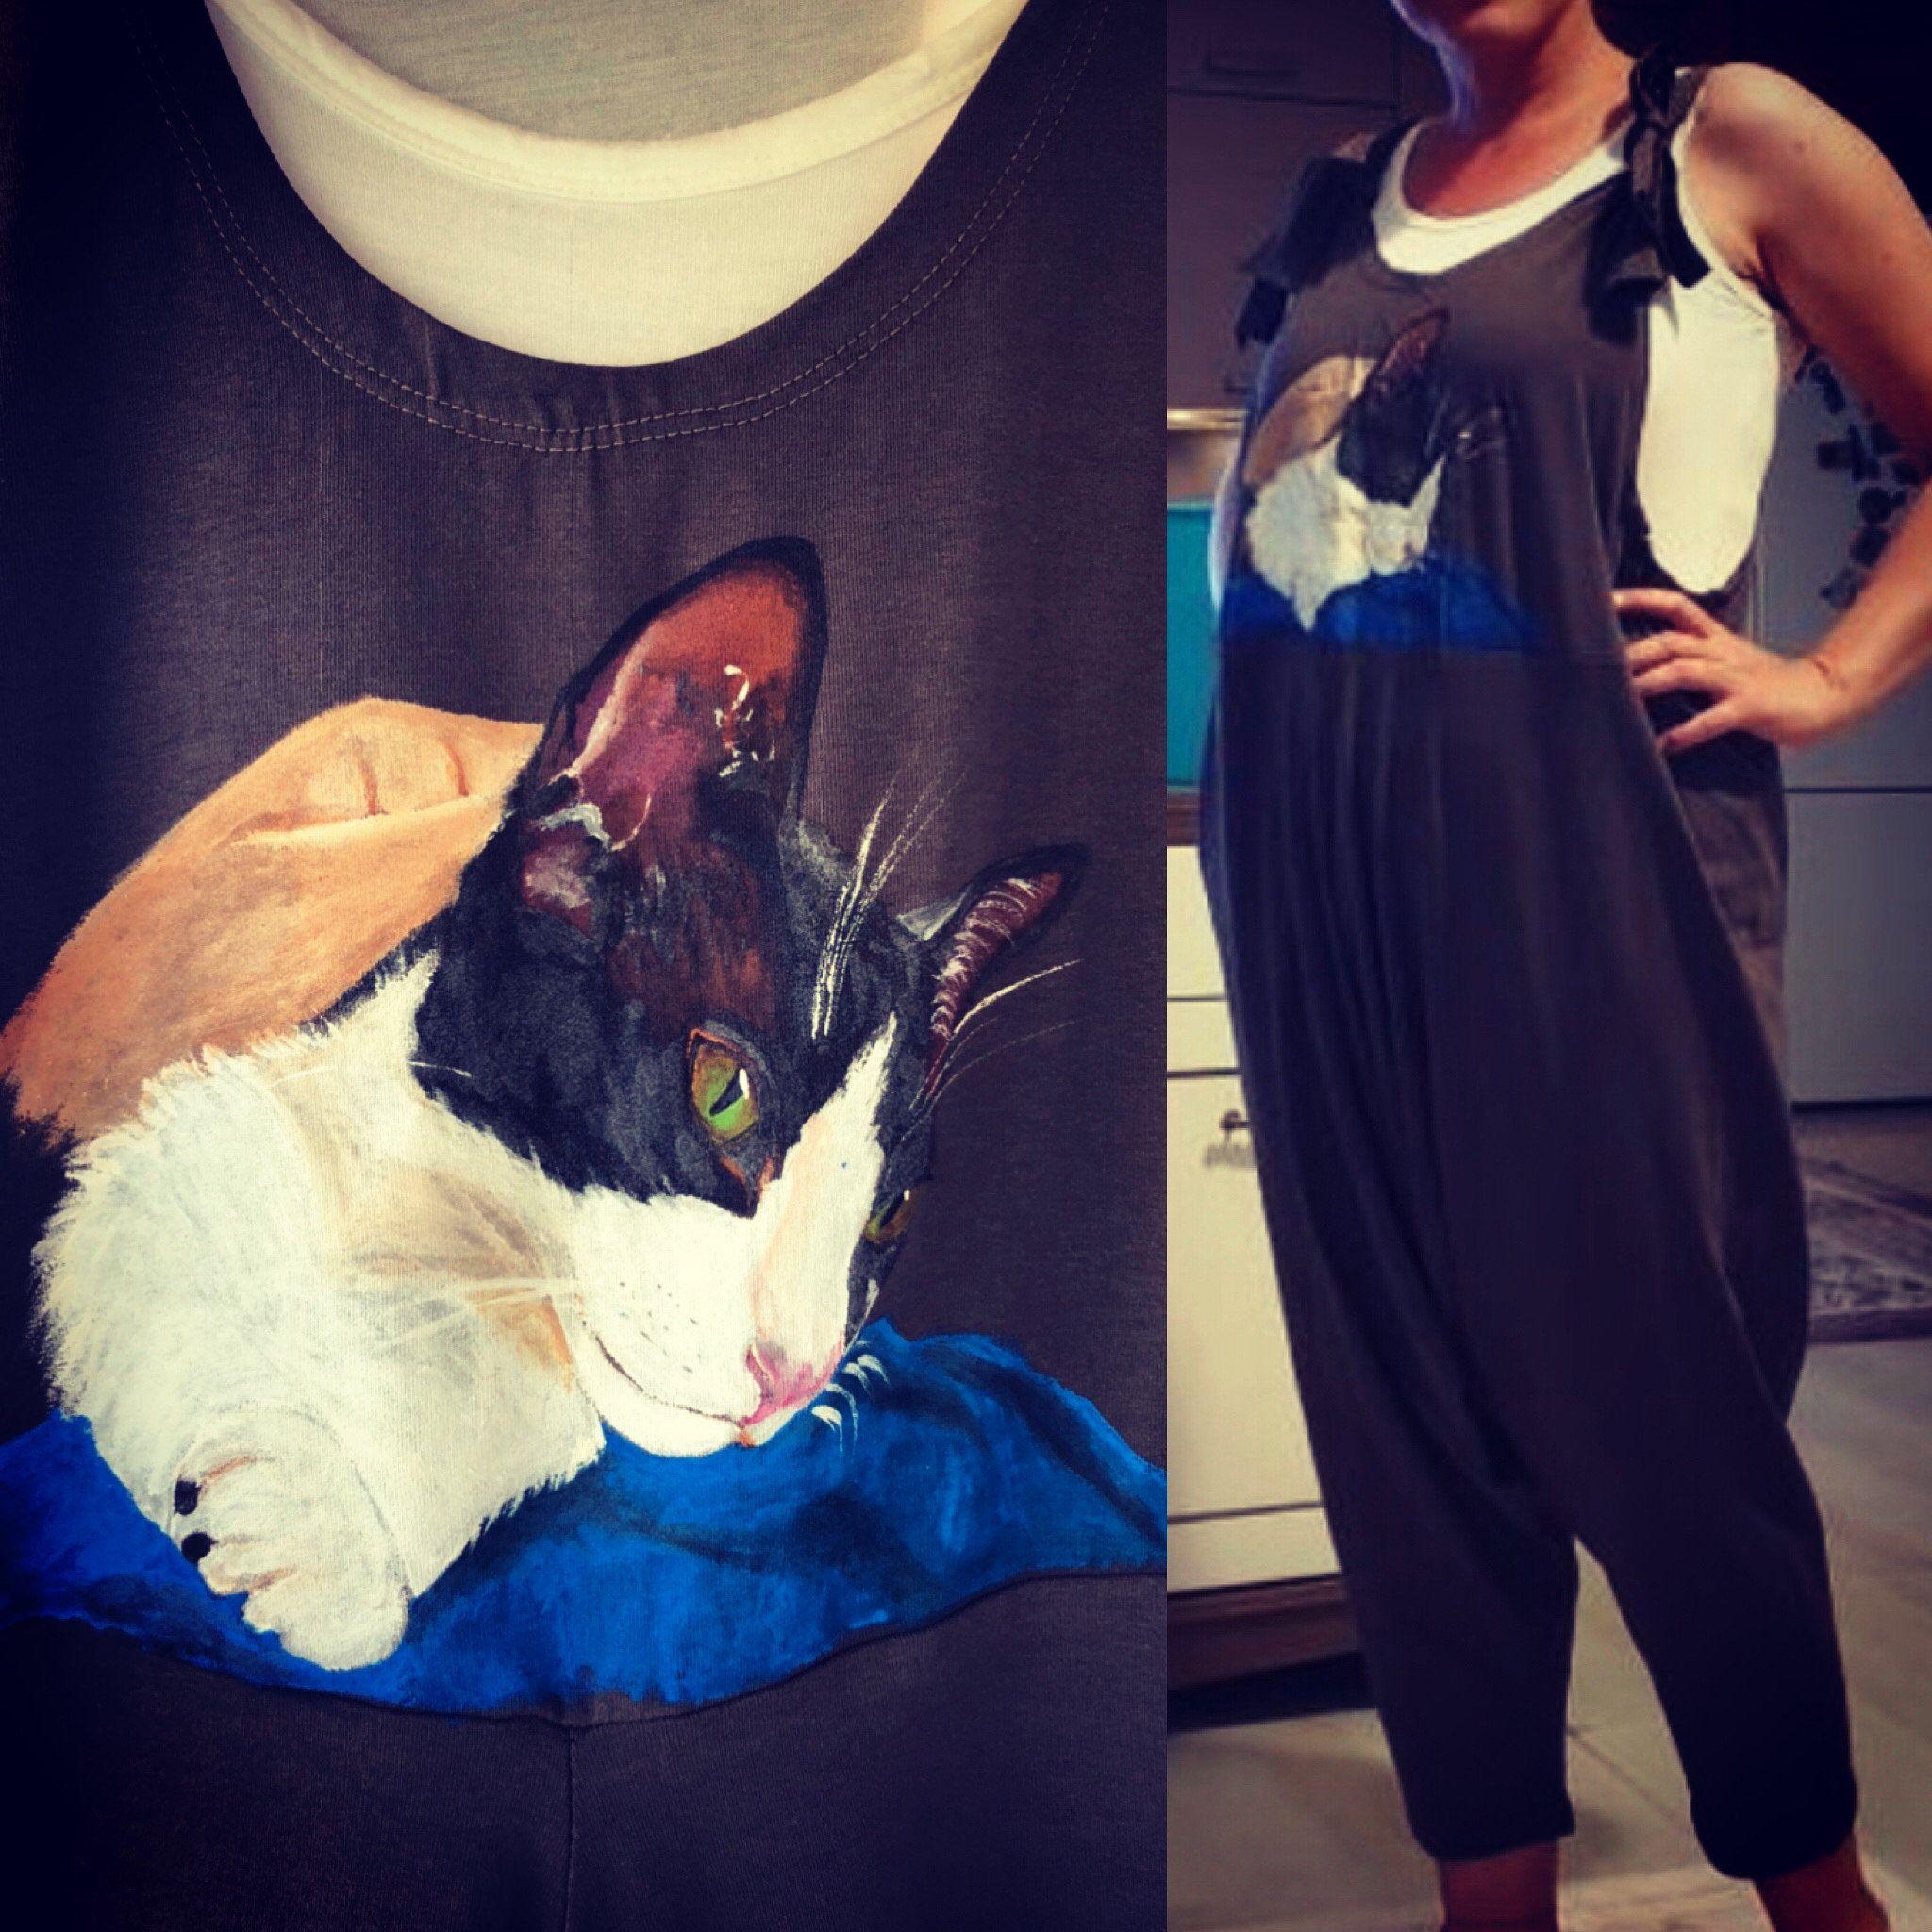 Handmade Painting Cotton Jumpsuit For Women Jumsuit Female Etsy In 2020 Cotton Jumpsuit Beautiful Jumpsuits Loose Trousers